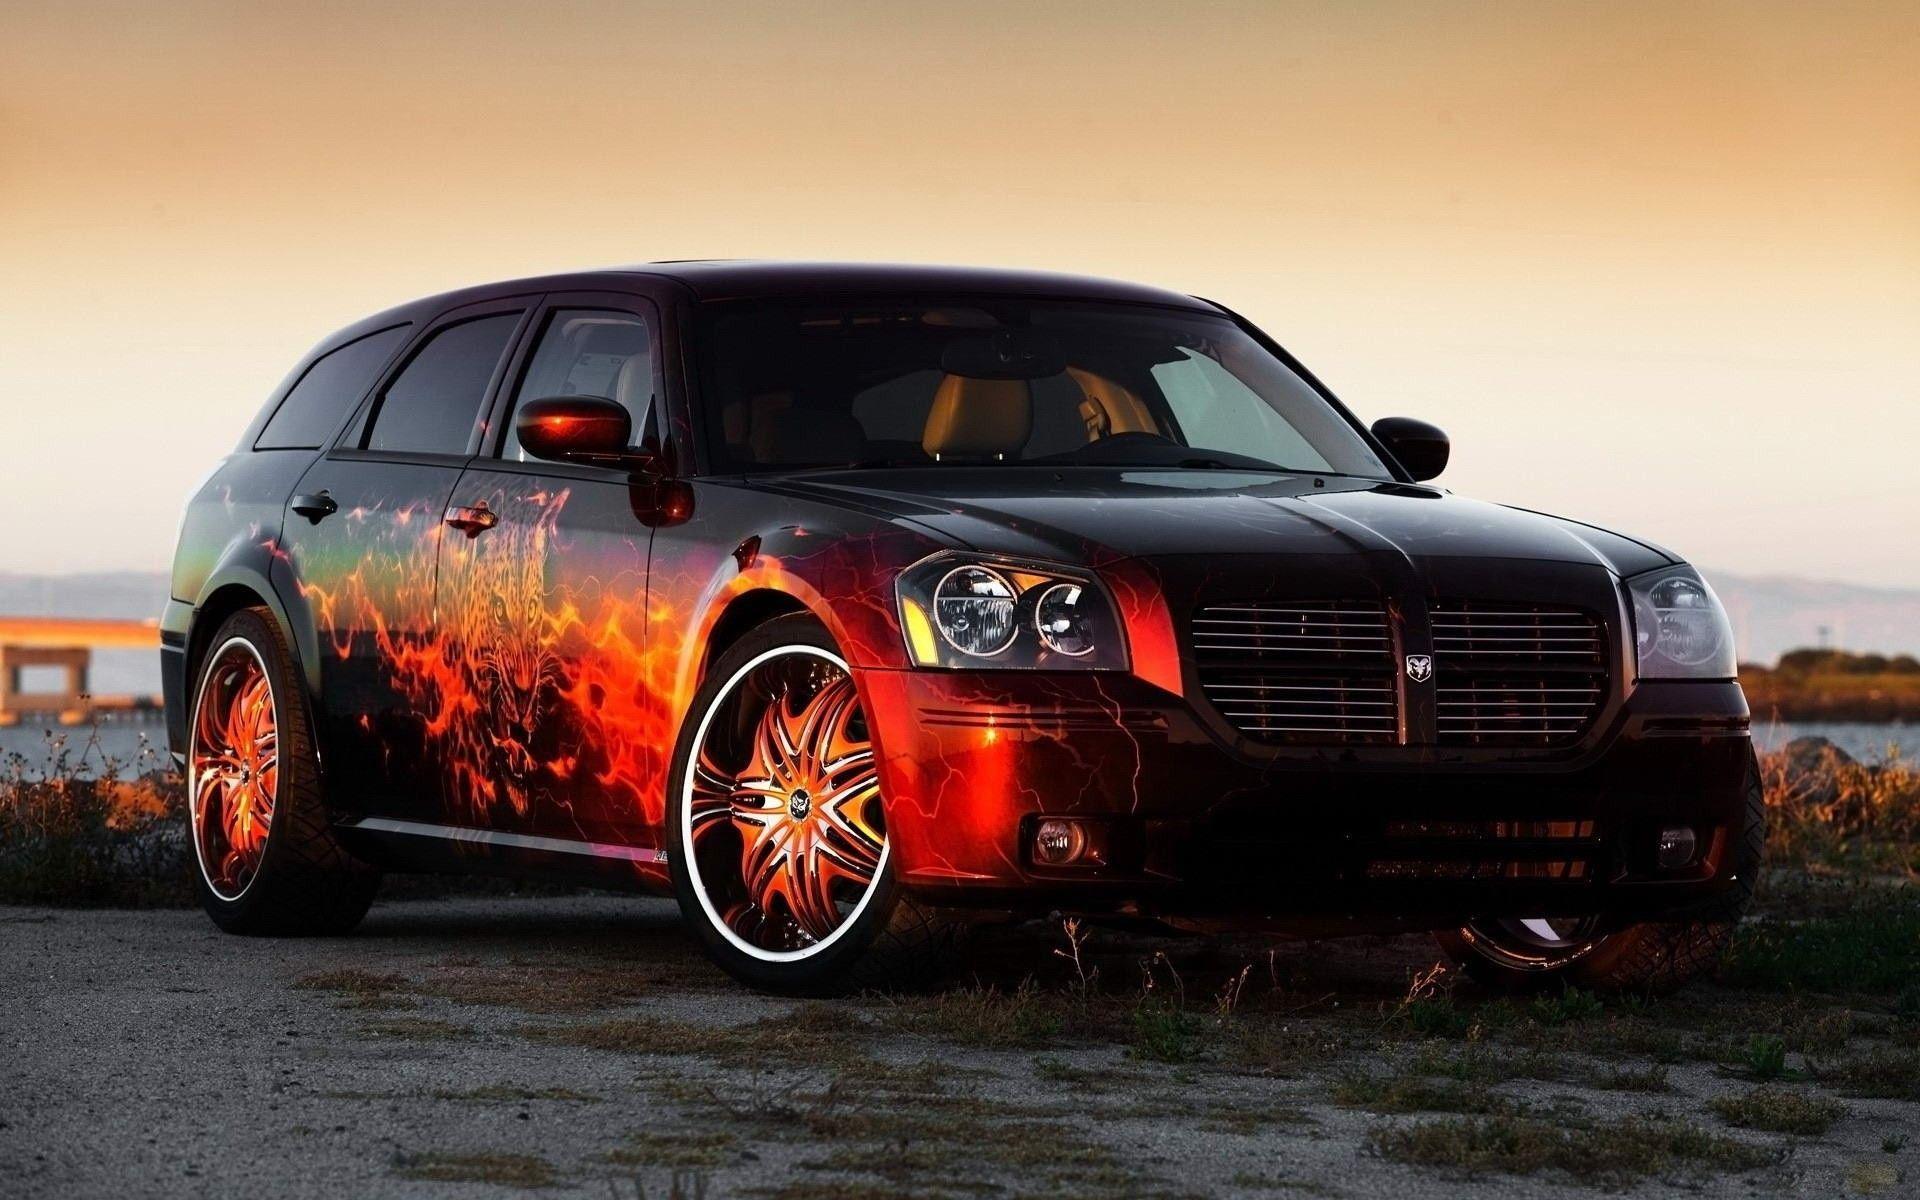 Car Drifting Wallpaper Hd 1080p Wallpapers Of Sports Cars Wallpaper Cave